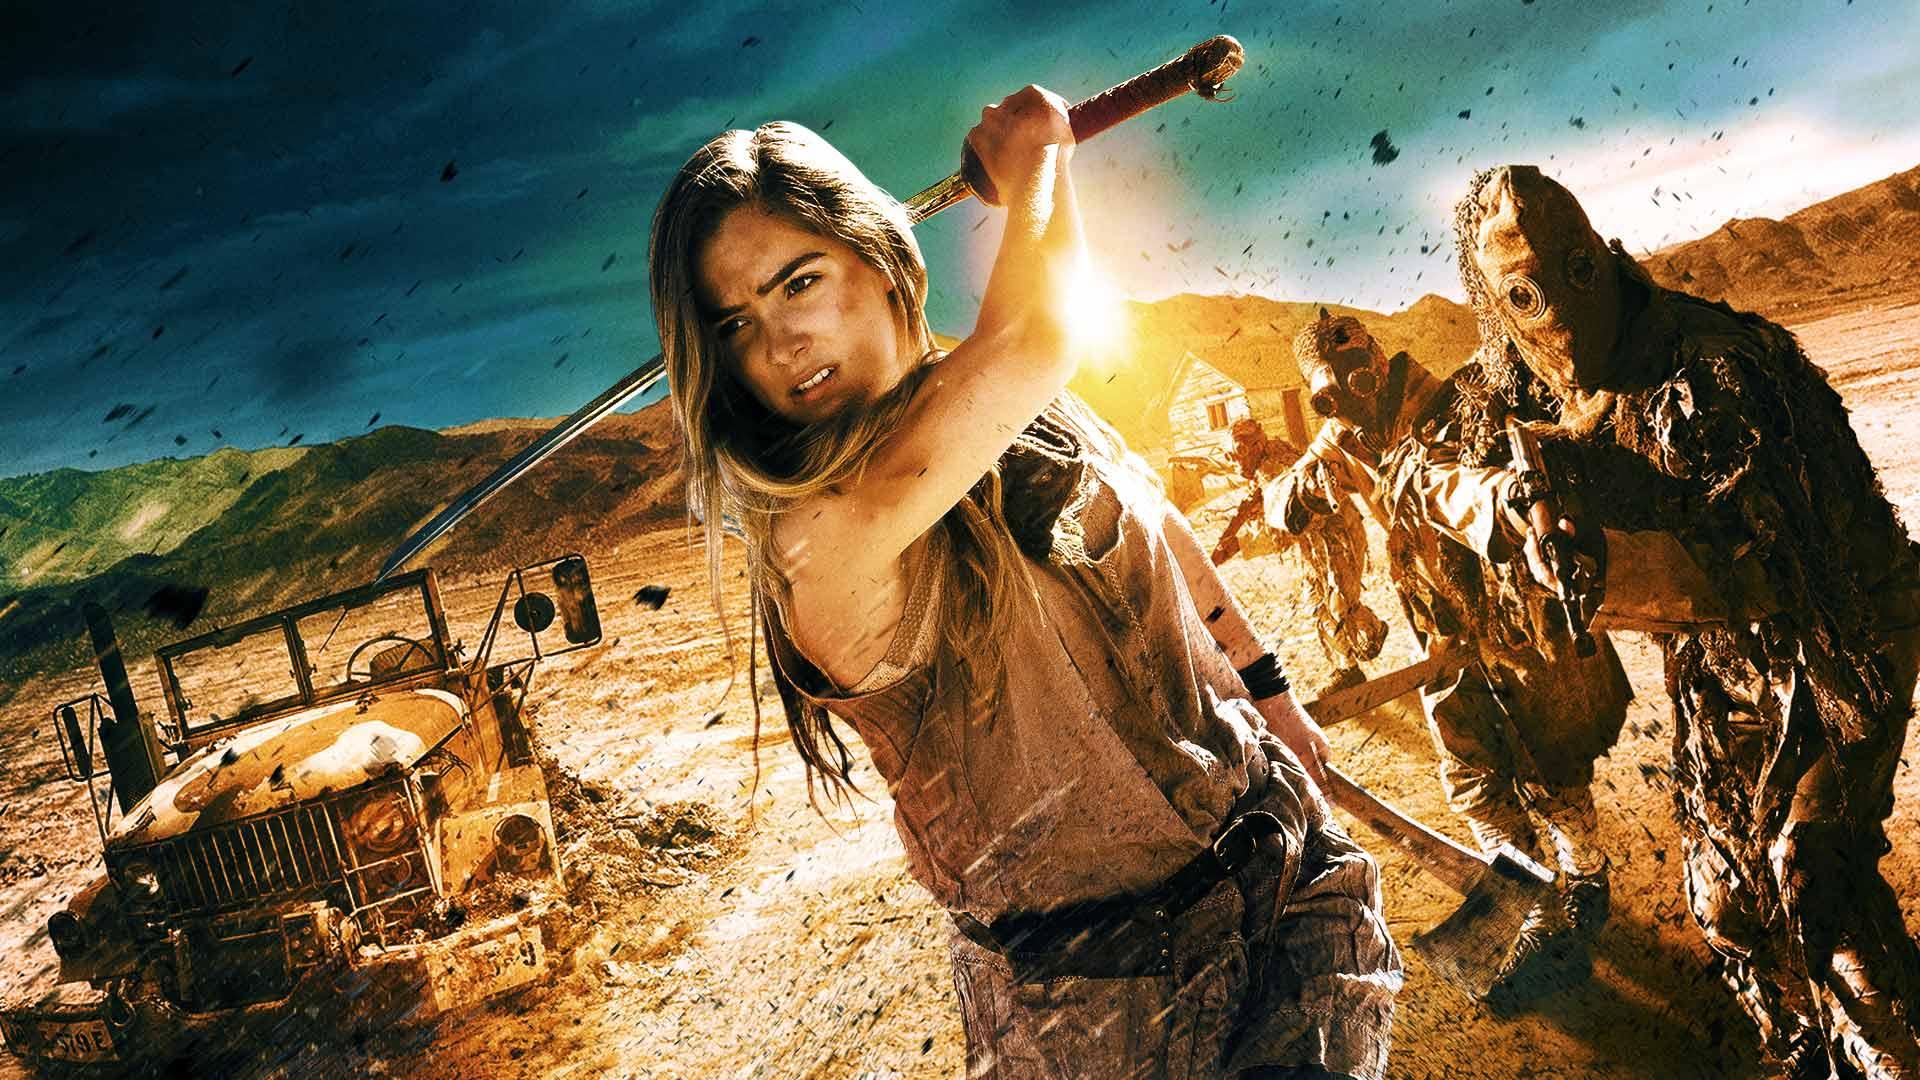 Survivor 2014 trailer / Pokkiri raja 2010 film in hindi